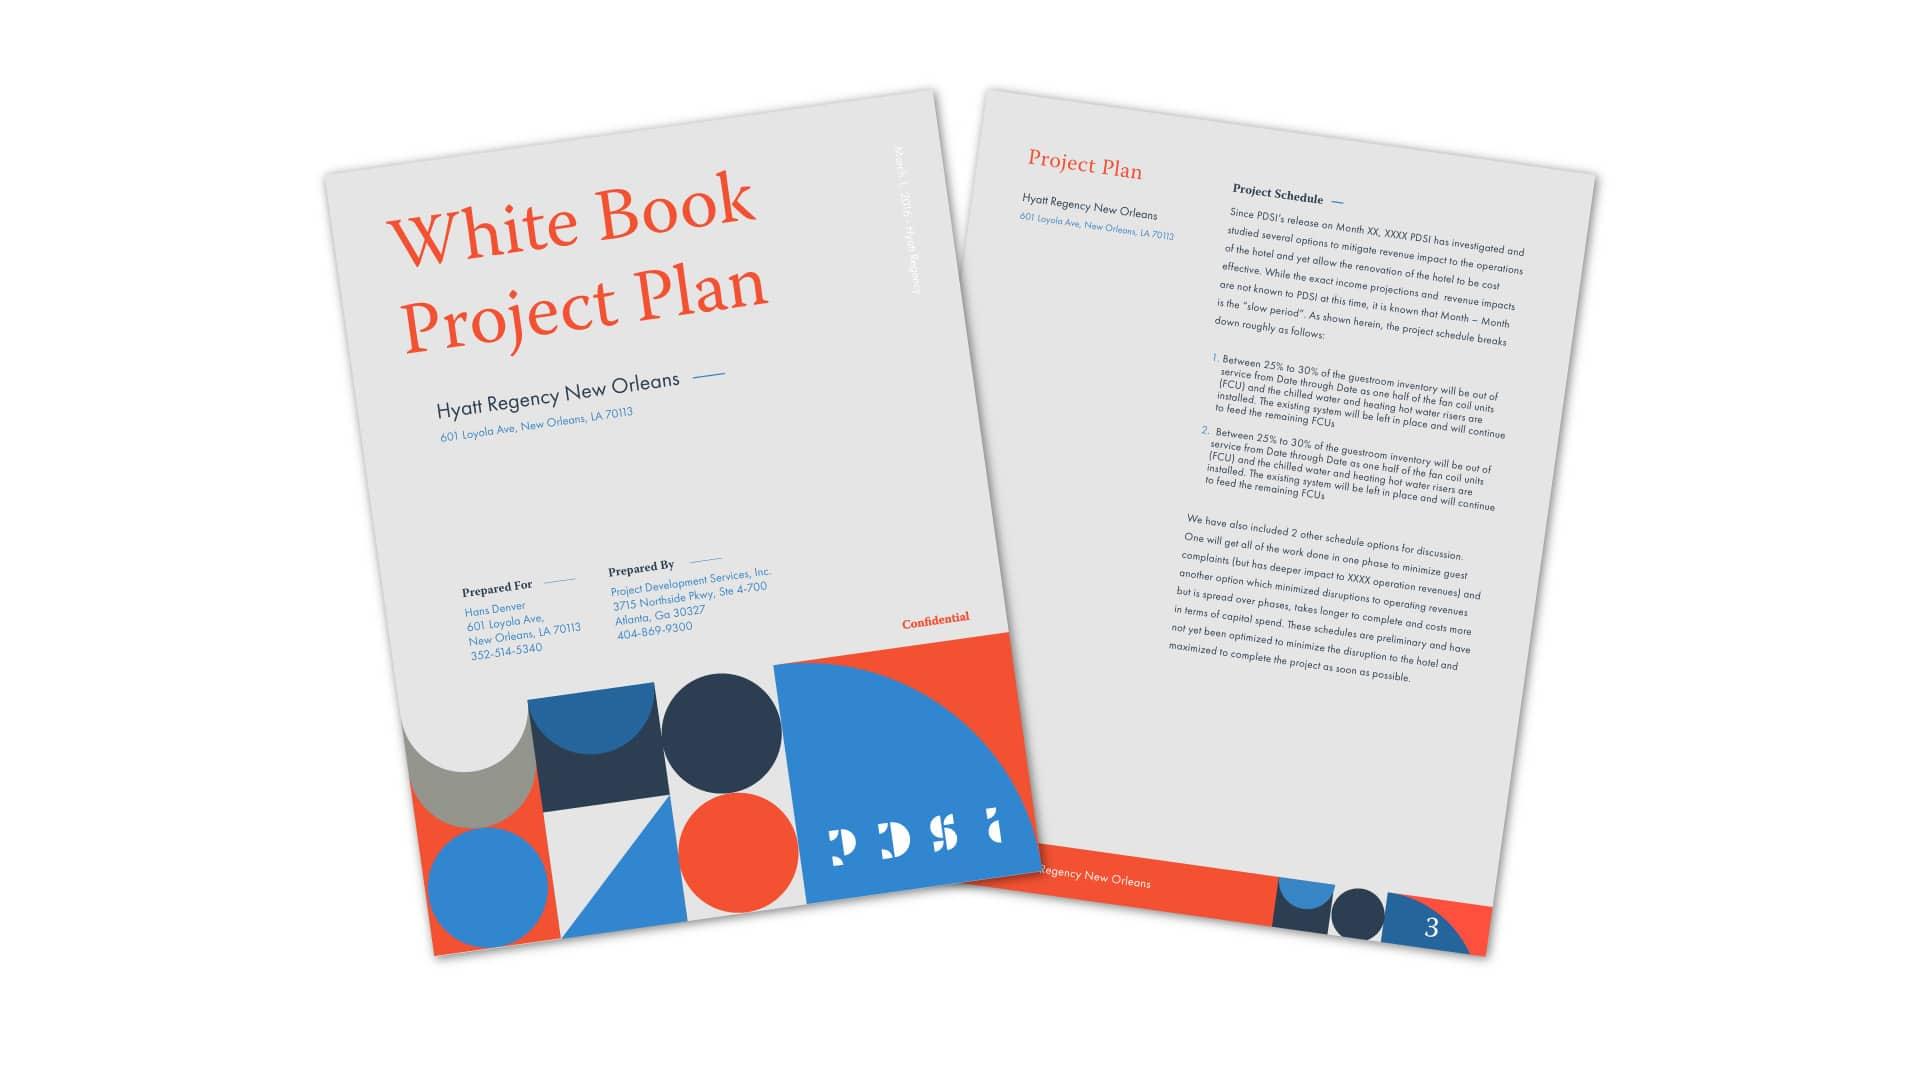 https://parisleaf.com/wp-content/uploads/2019/02/PDSI-whitebook.jpg